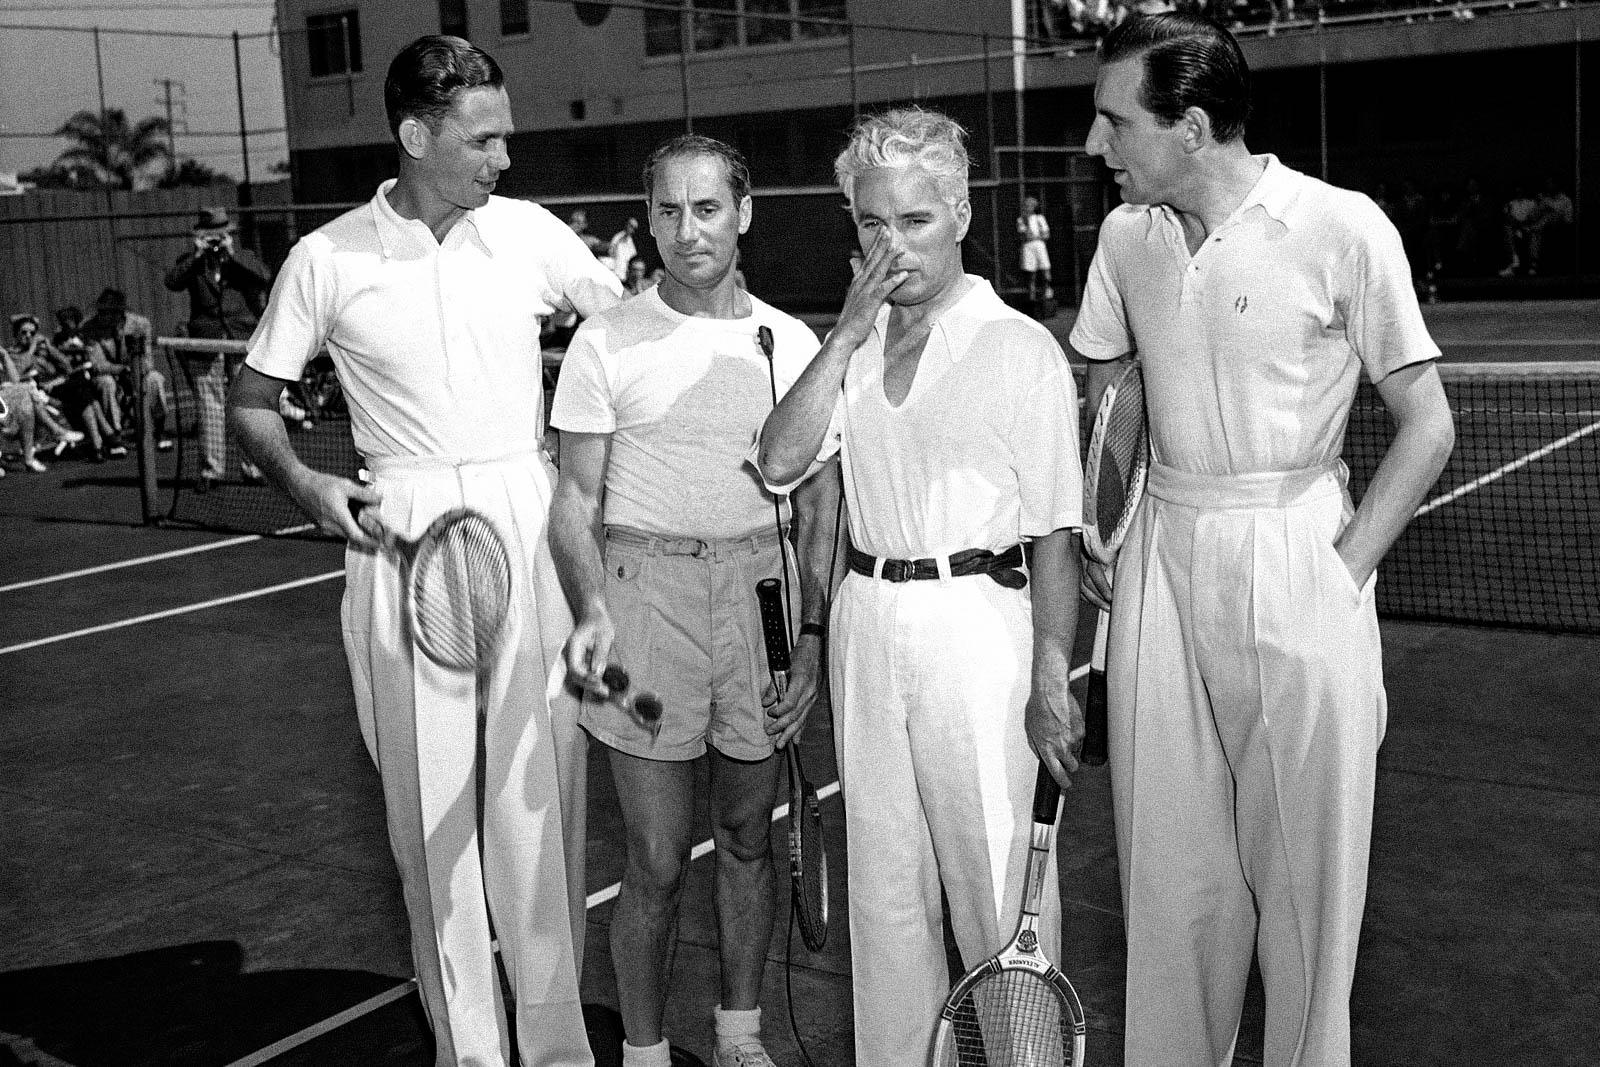 Vines-Groucho-Chaplin-y-Vines-AP-Beverly-Hills-1937